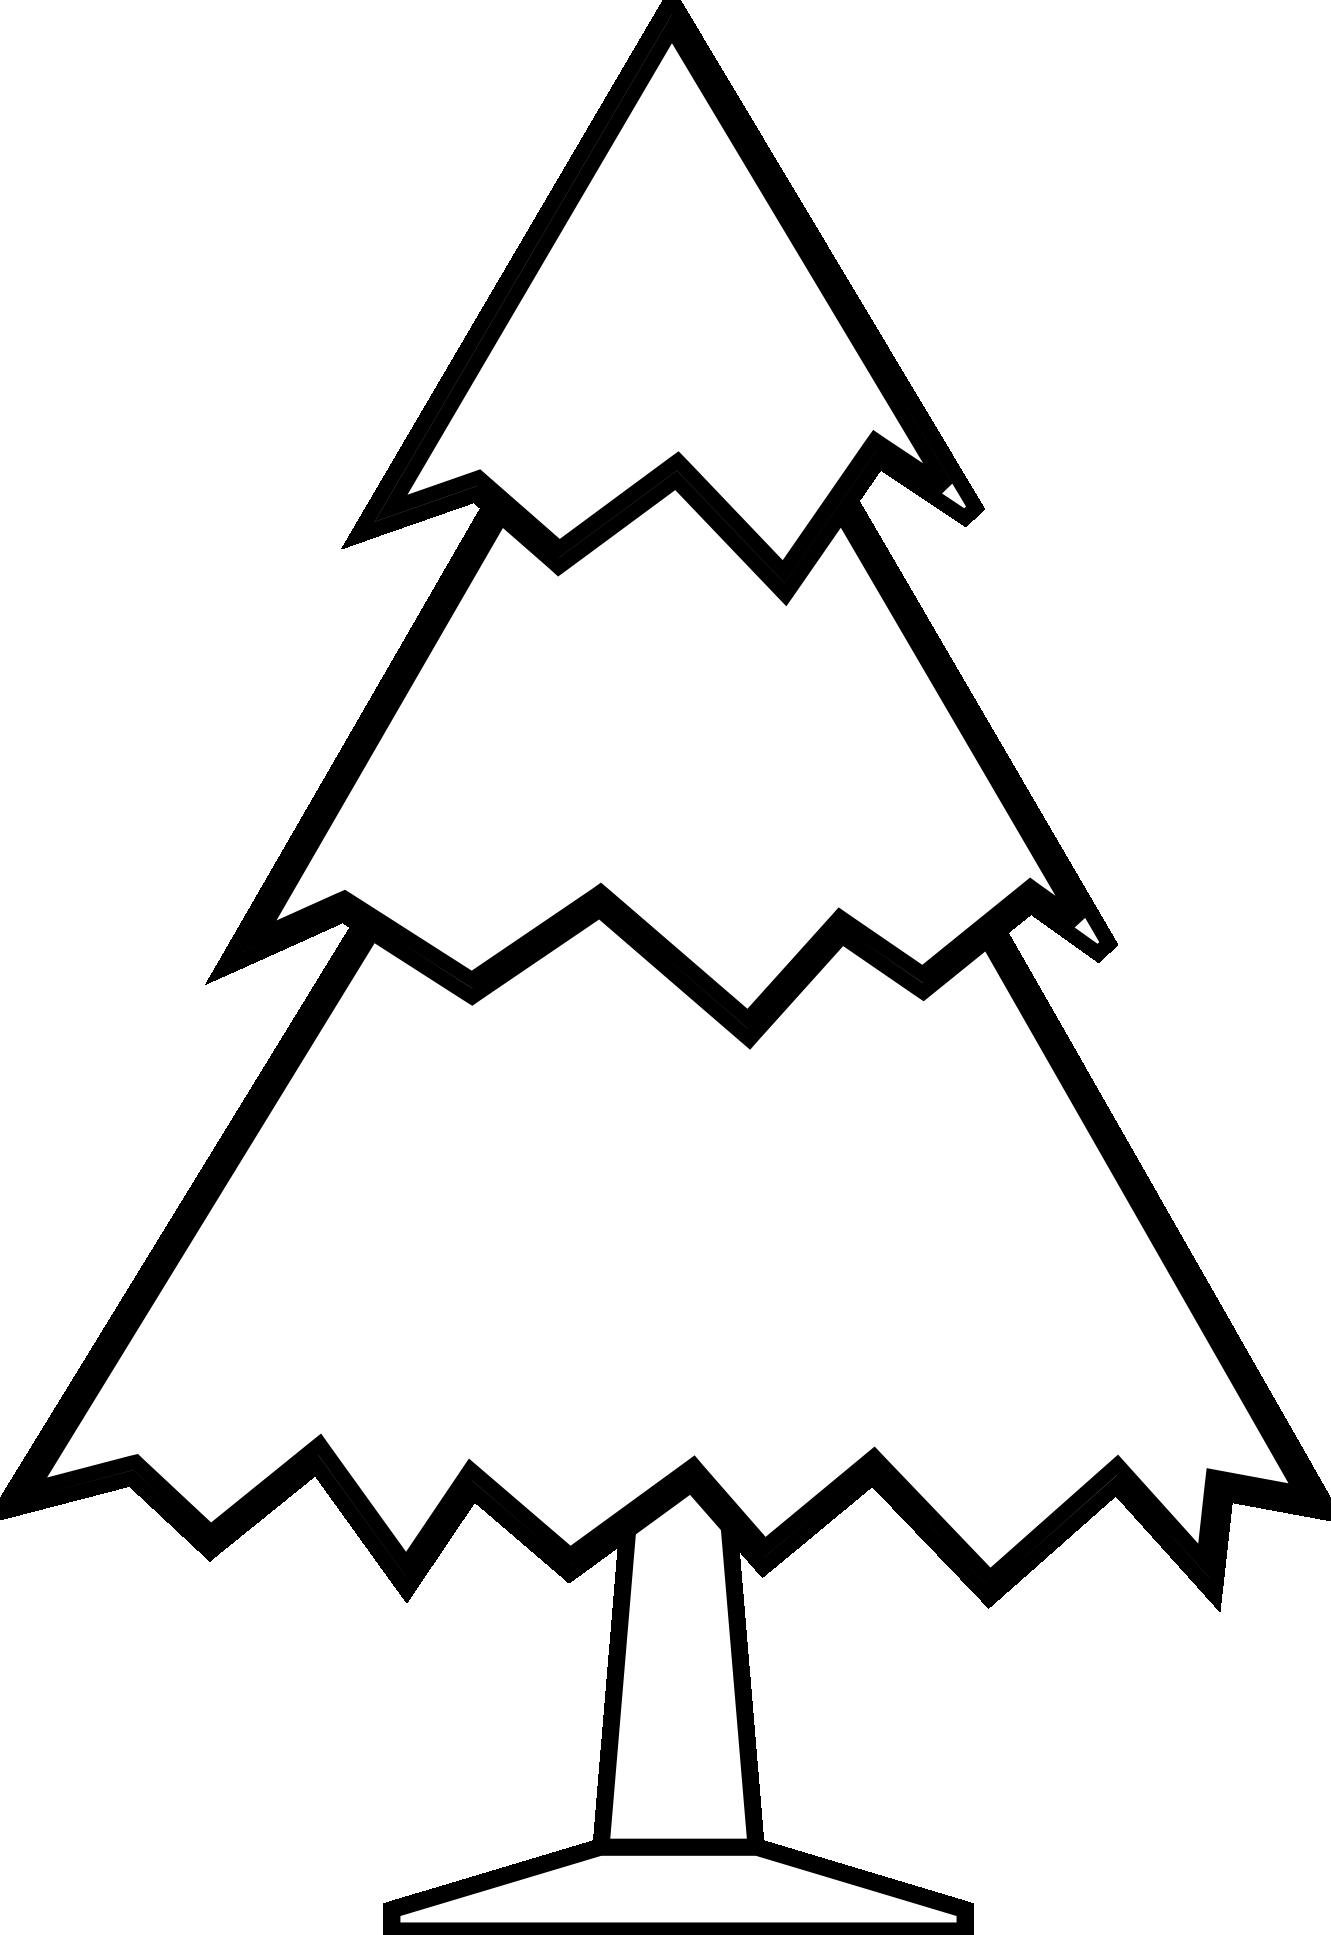 1331x1935 Present Black And White Christmas Ornament Clipart Black And White